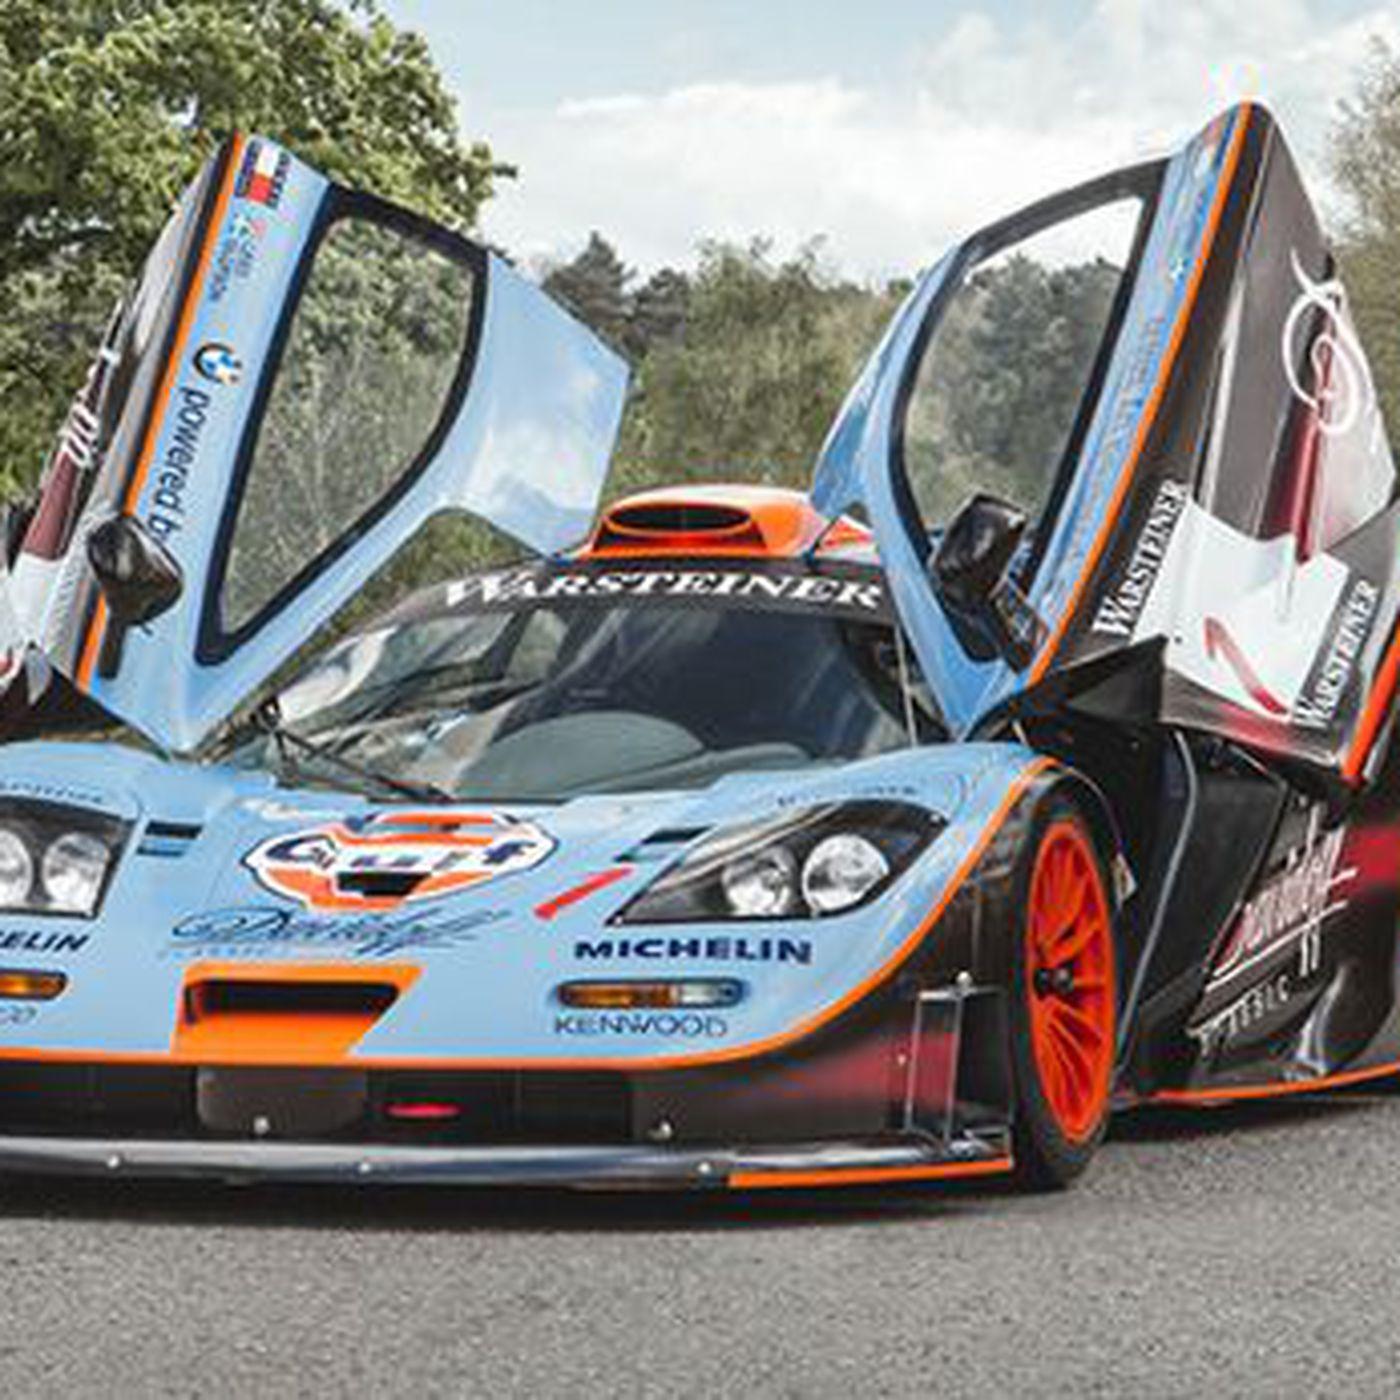 Top Gear S Mclaren F1 Is Up For Sale The Verge